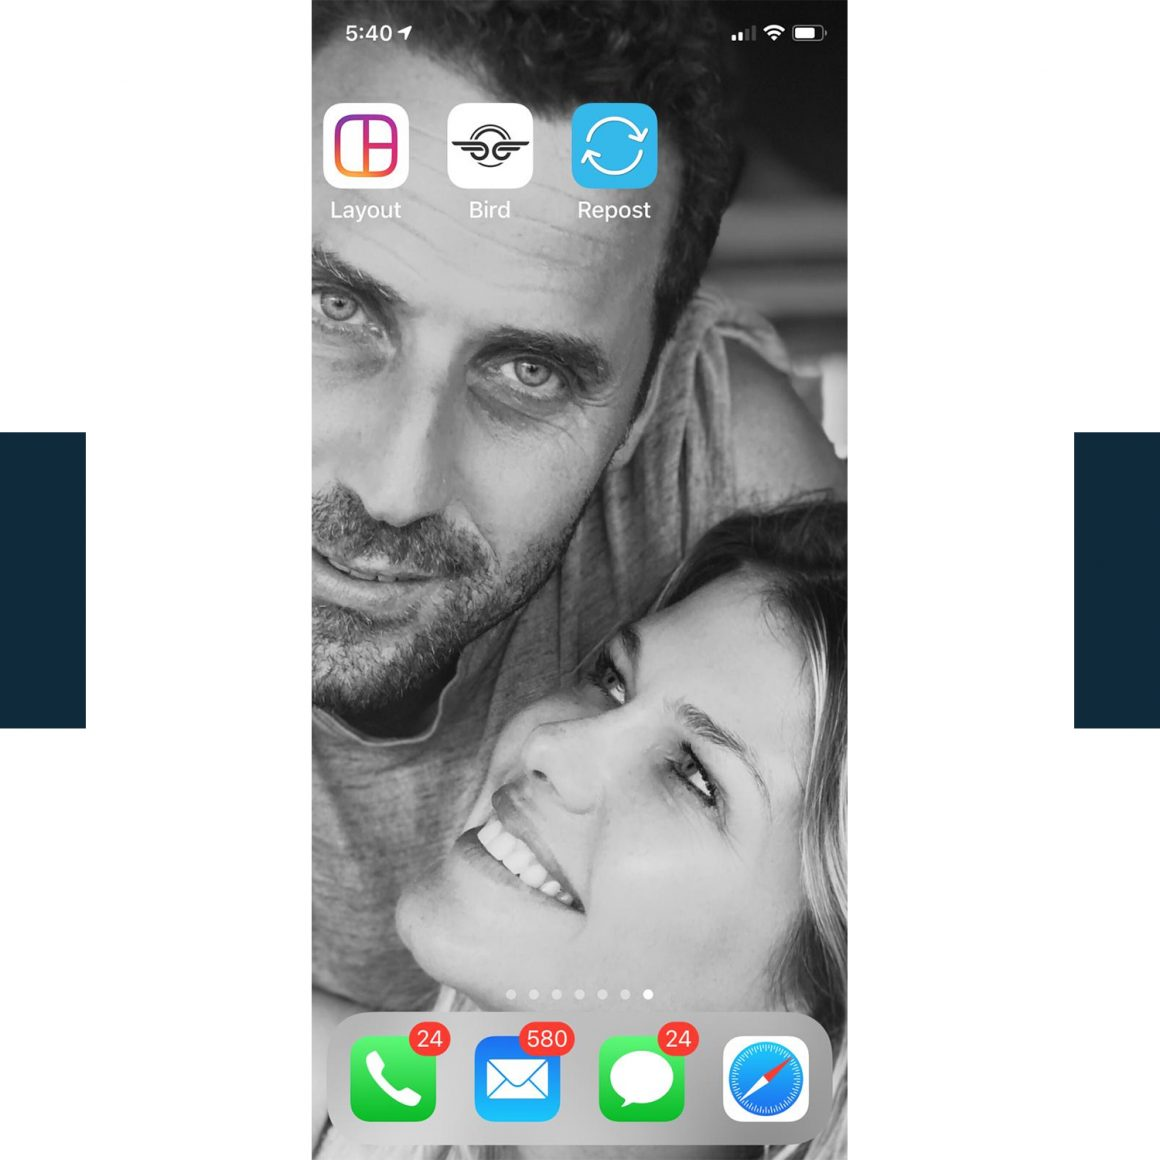 Le fond d'écran du téléphone d'Ingrid Seynhaeve